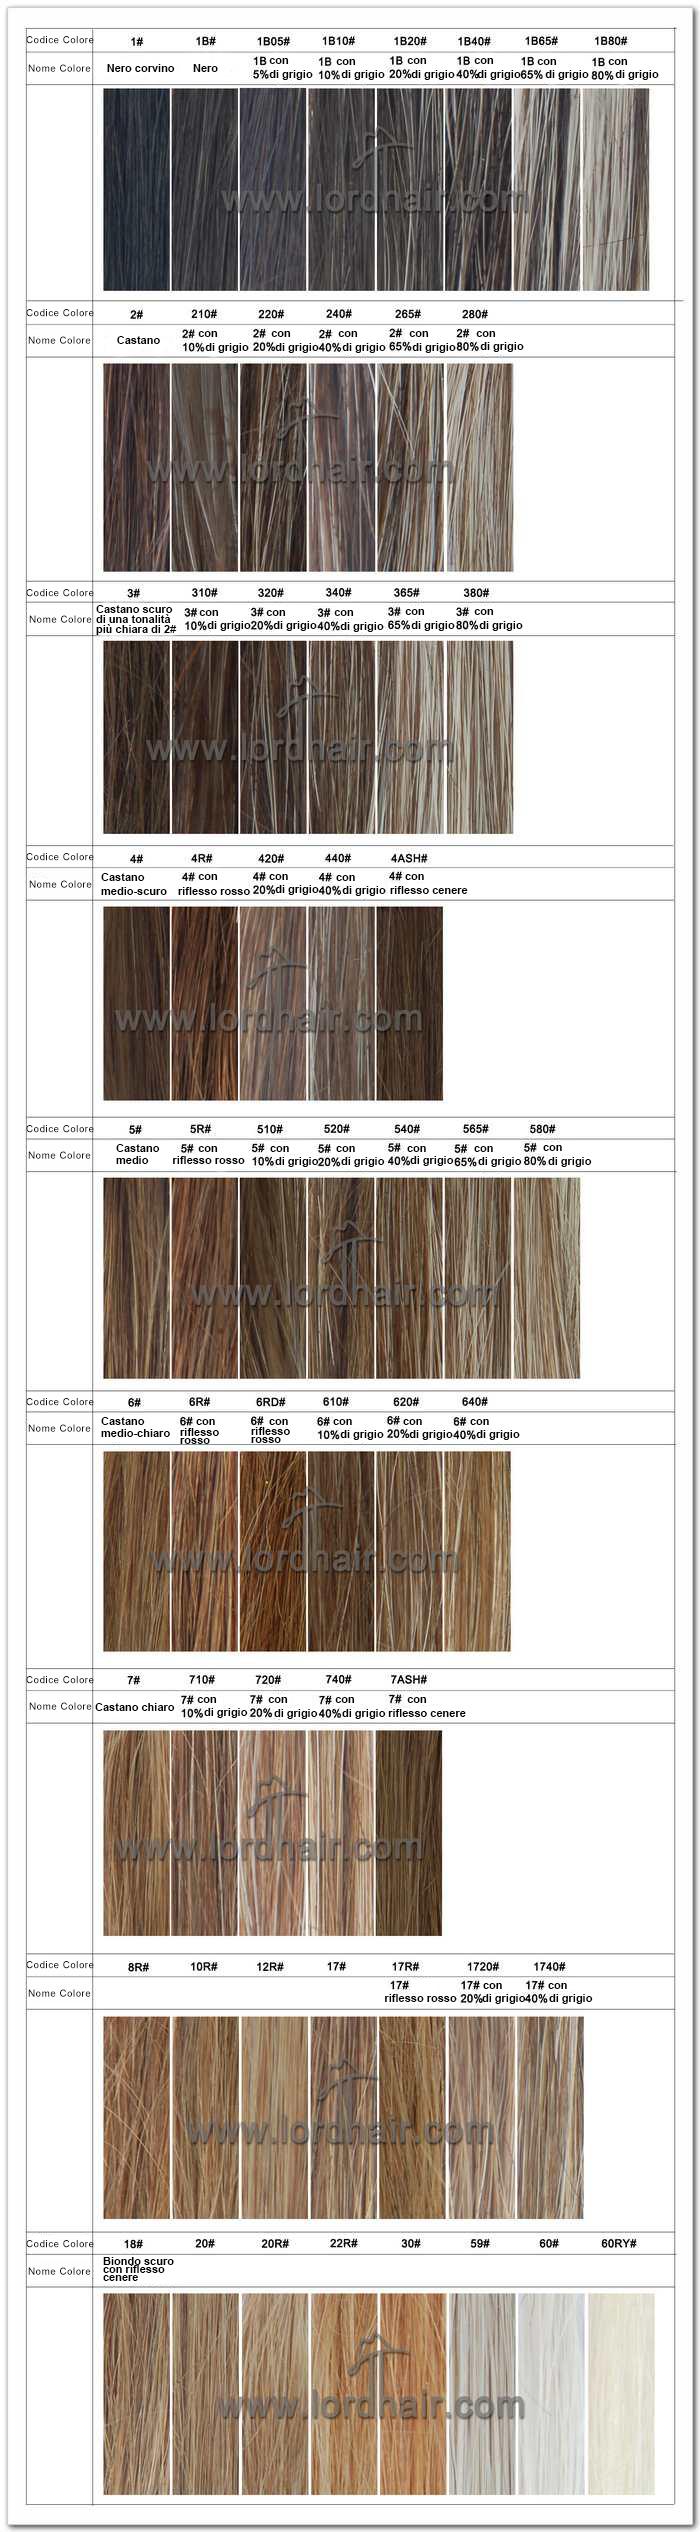 hair replacement mens hair color